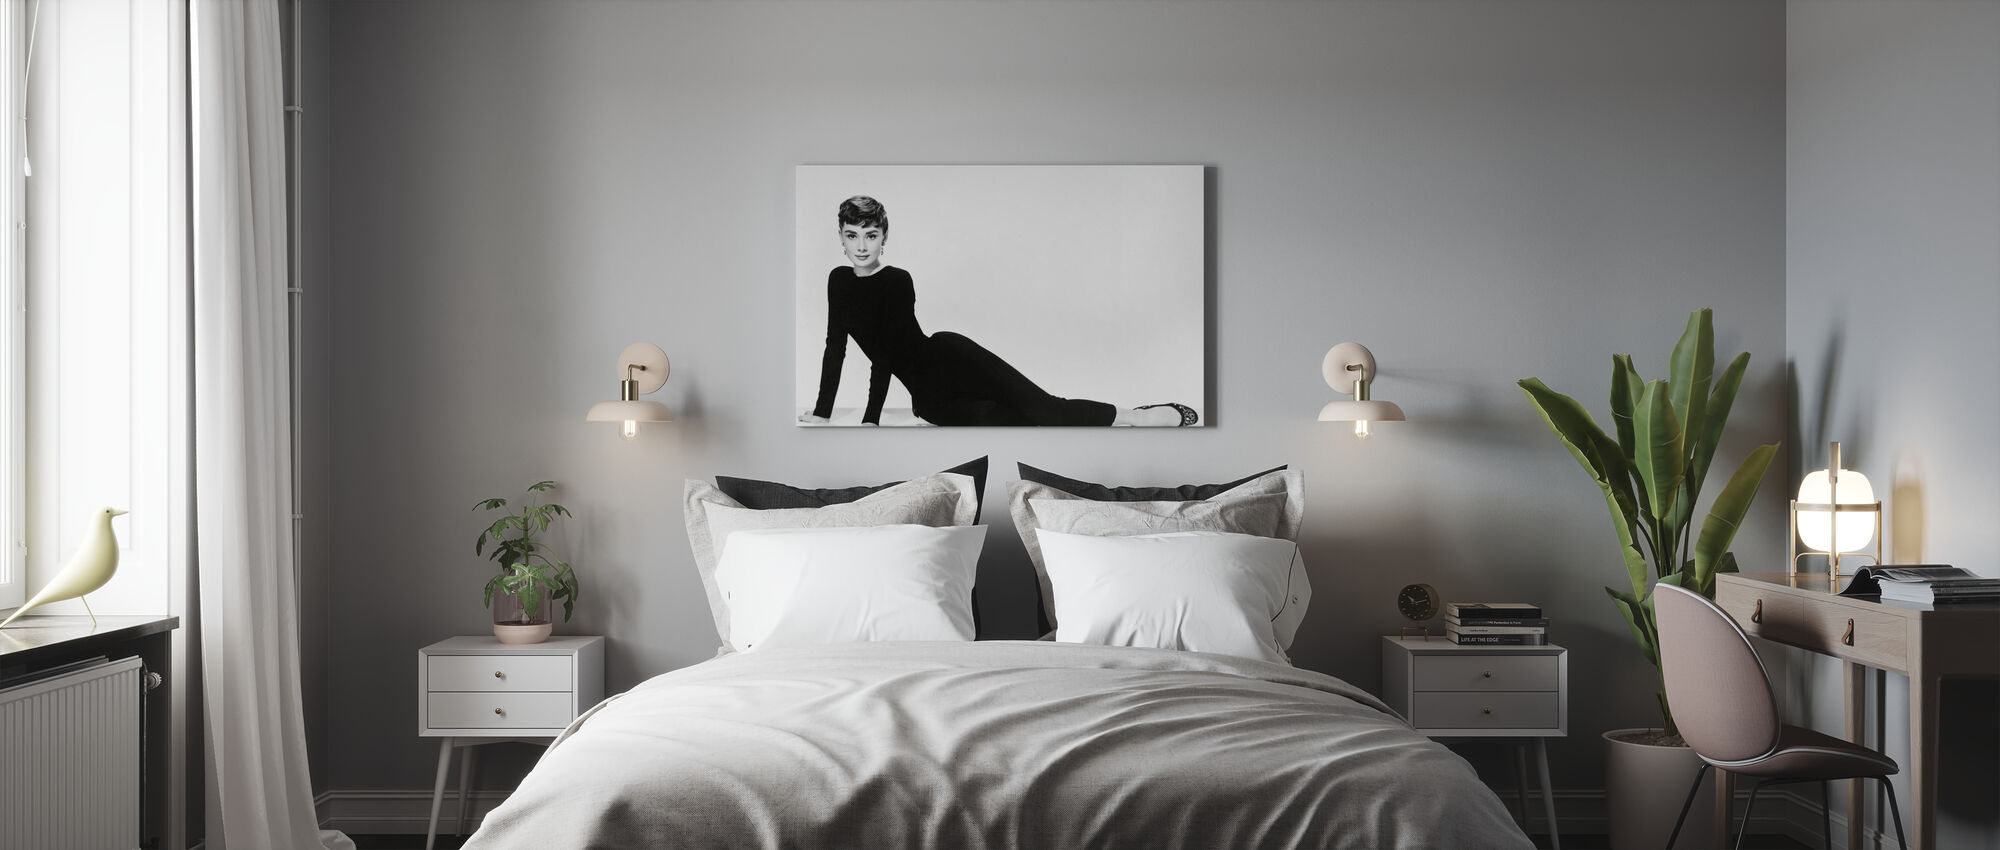 Audrey Hepburn in Sabrina - Canvas print - Bedroom